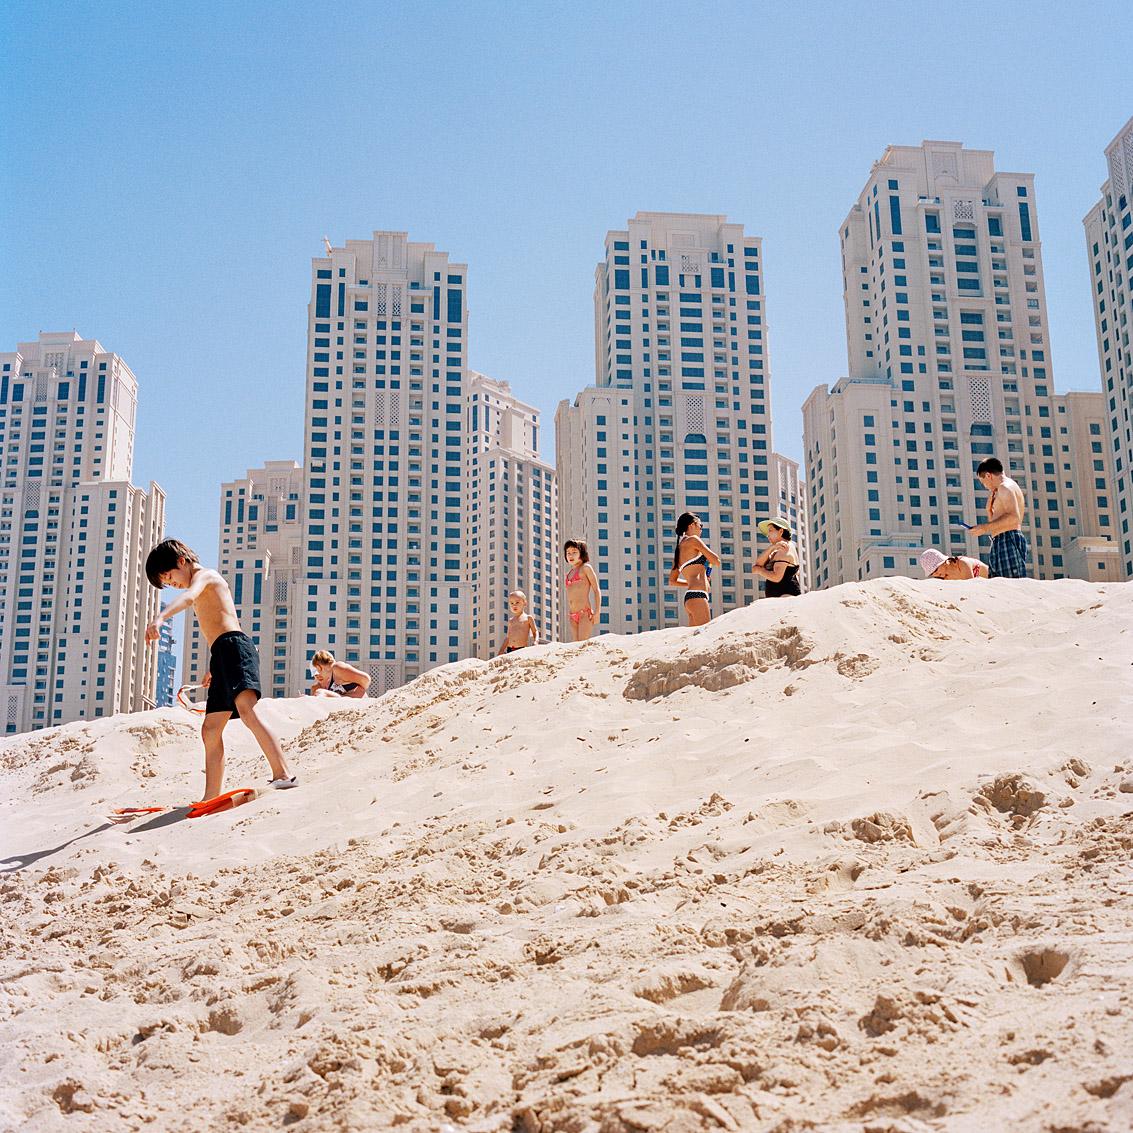 Plage de la Jumeirah Beach Residence; Dubaï.